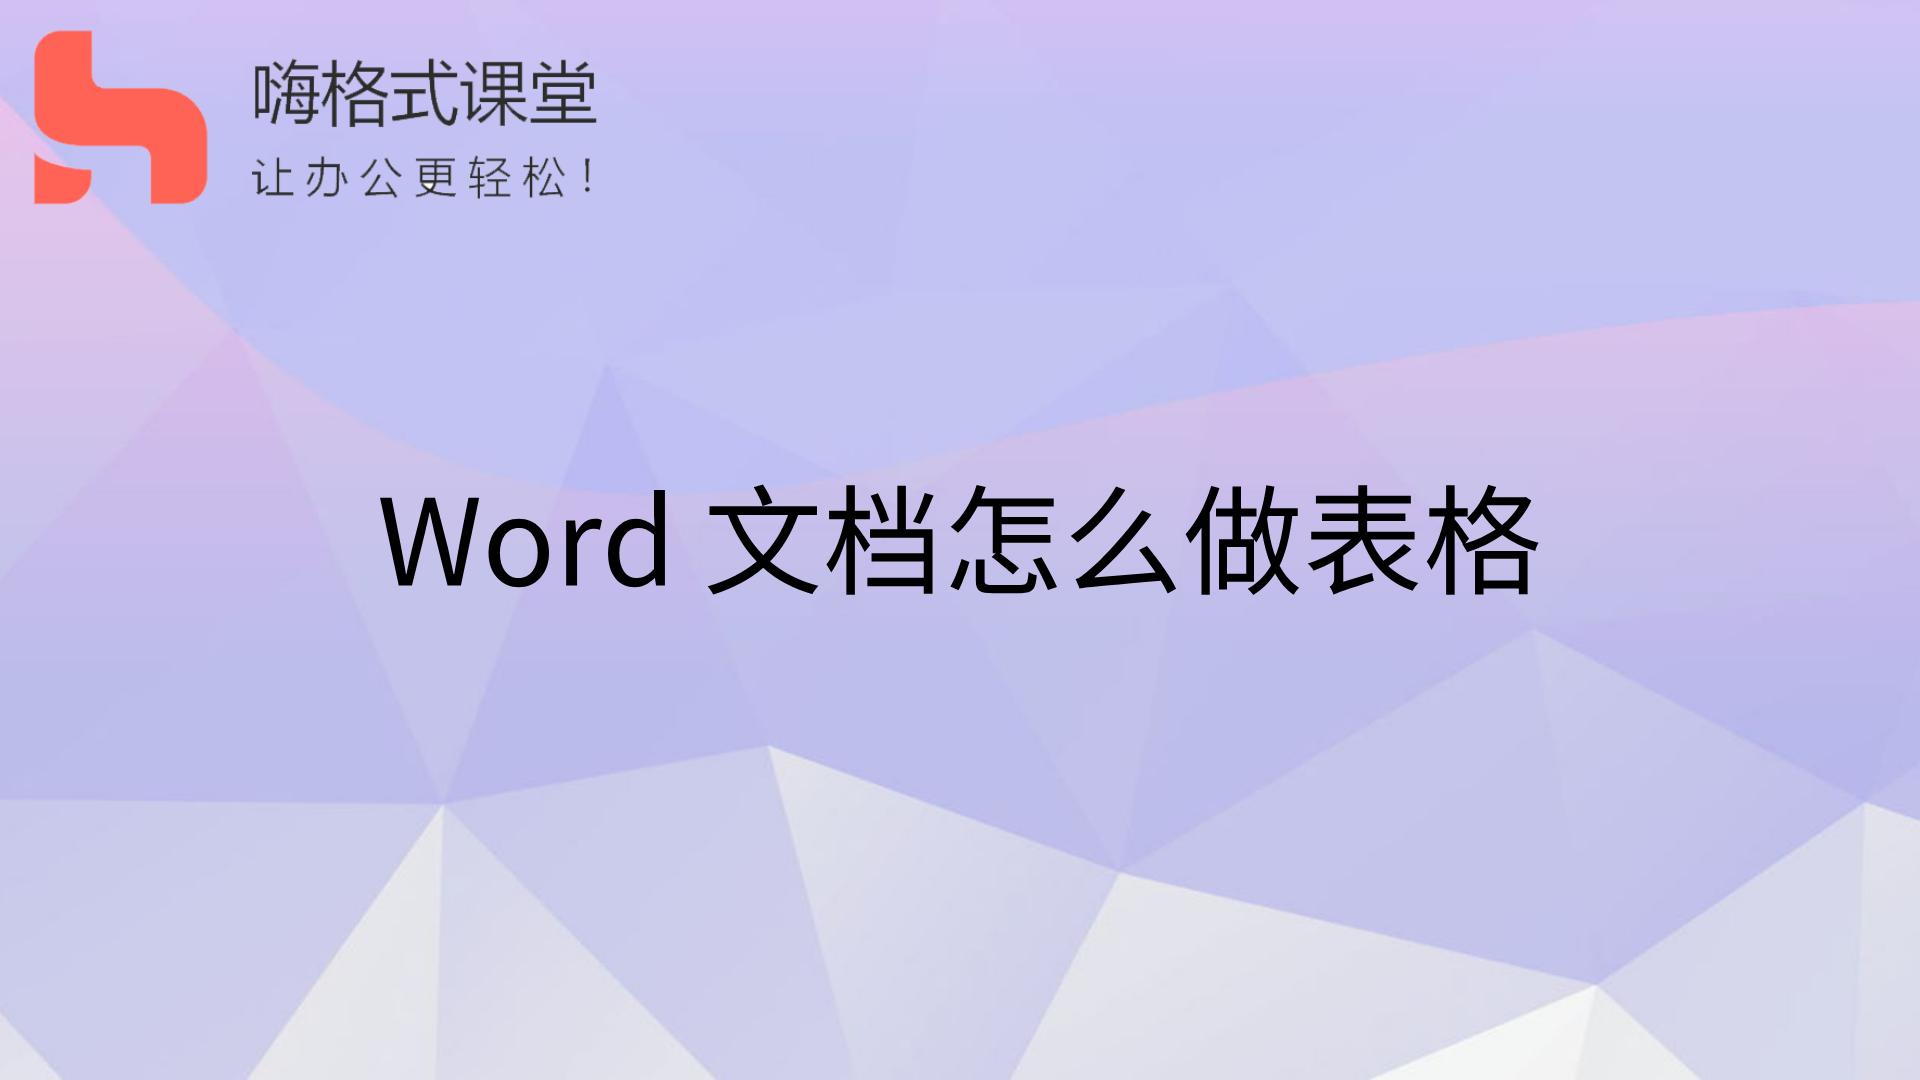 Word 文档怎么做表格s